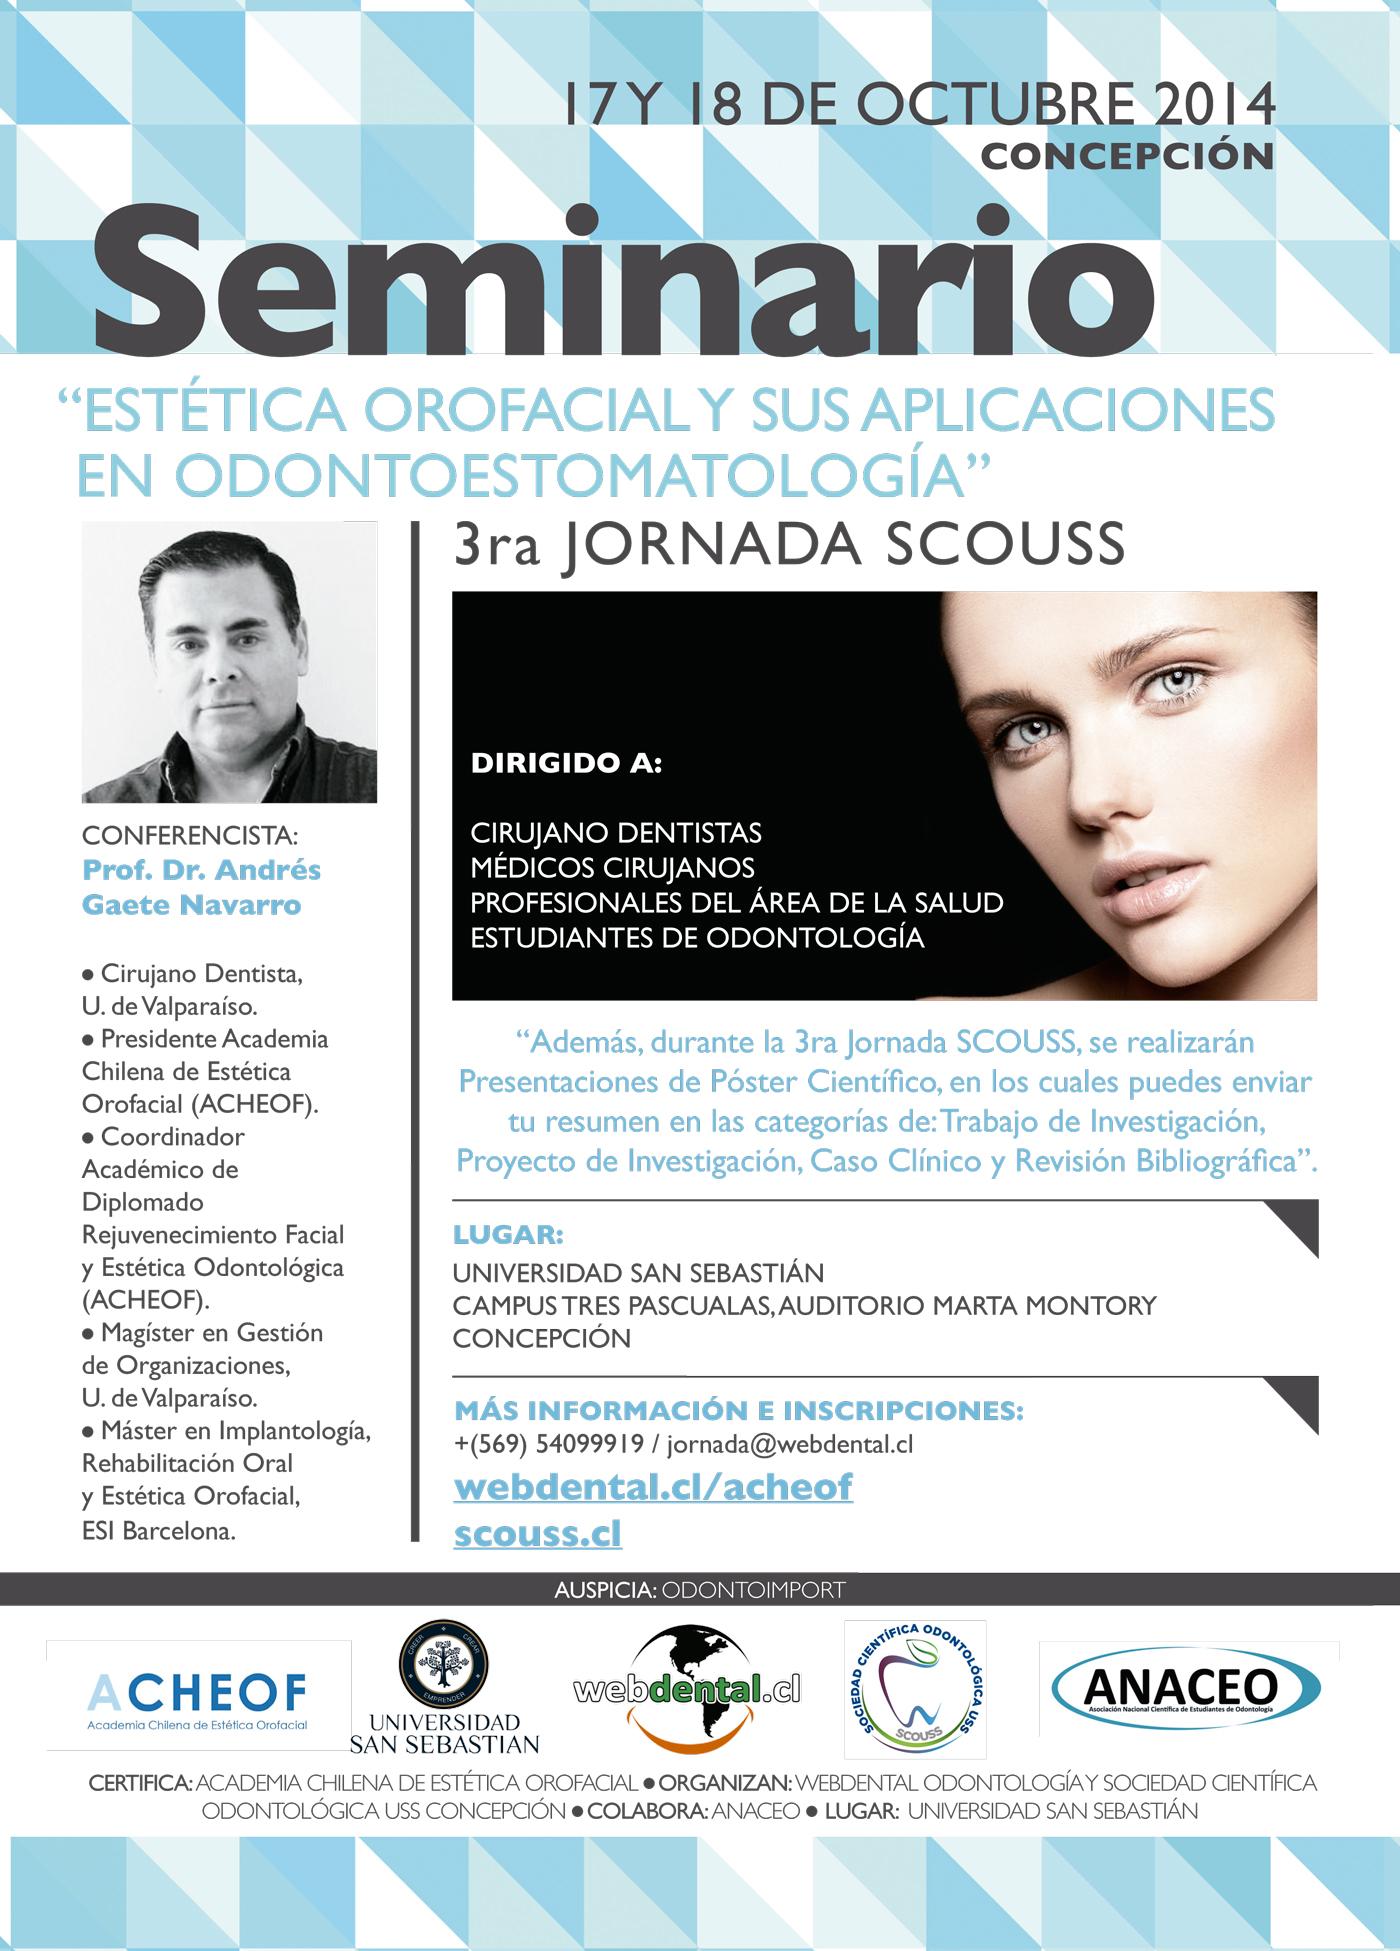 Seminario-Concepcion-2014-